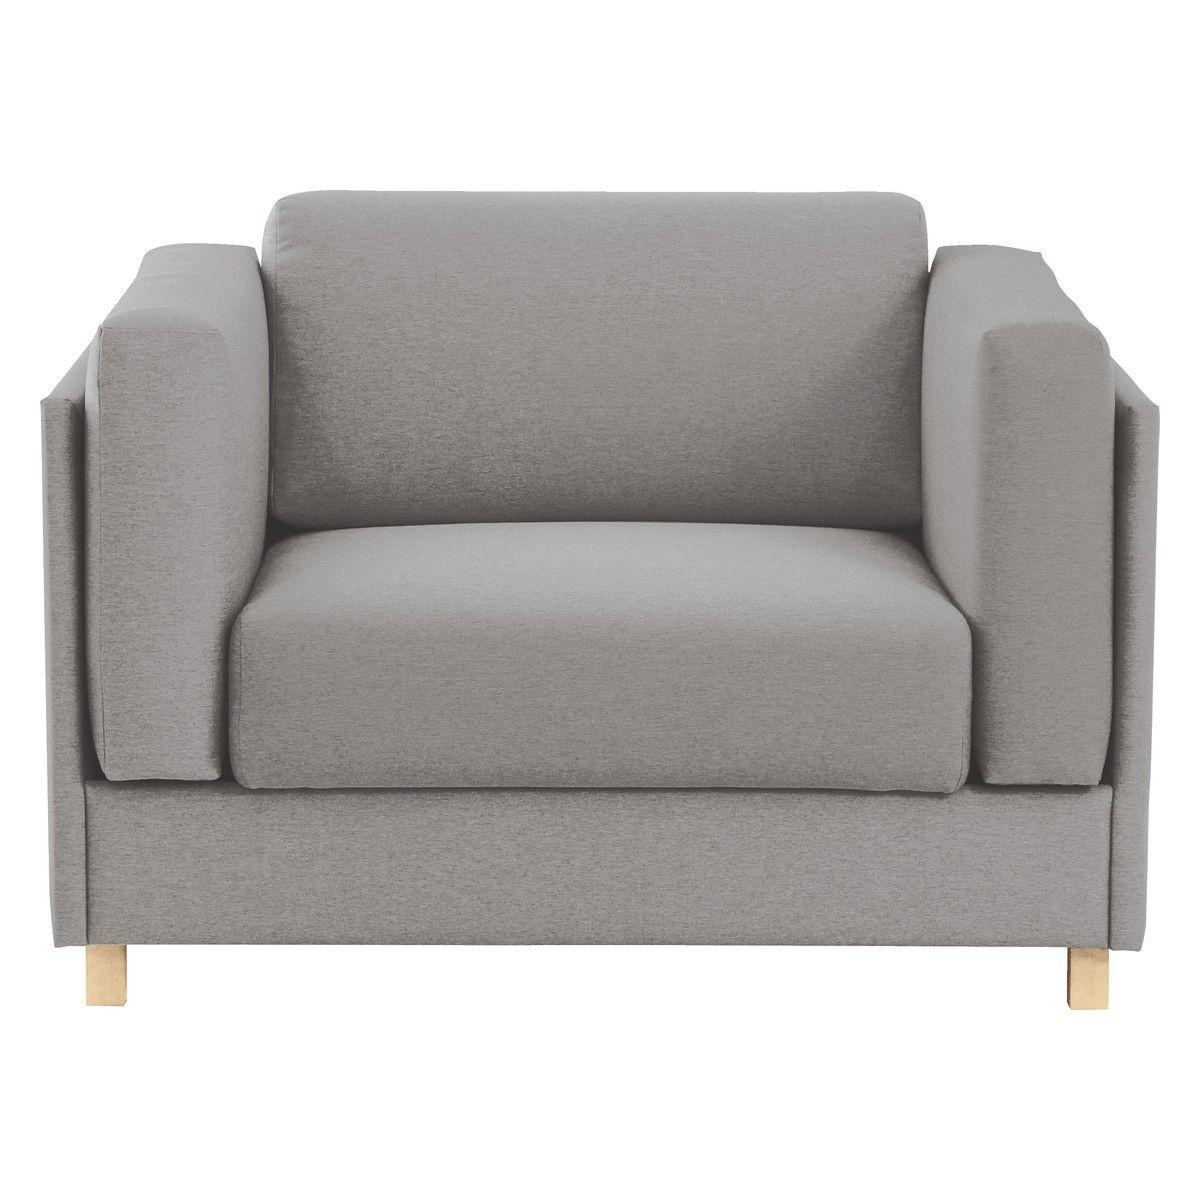 COLOMBO Grey Fabric Armchair Sofa Bed